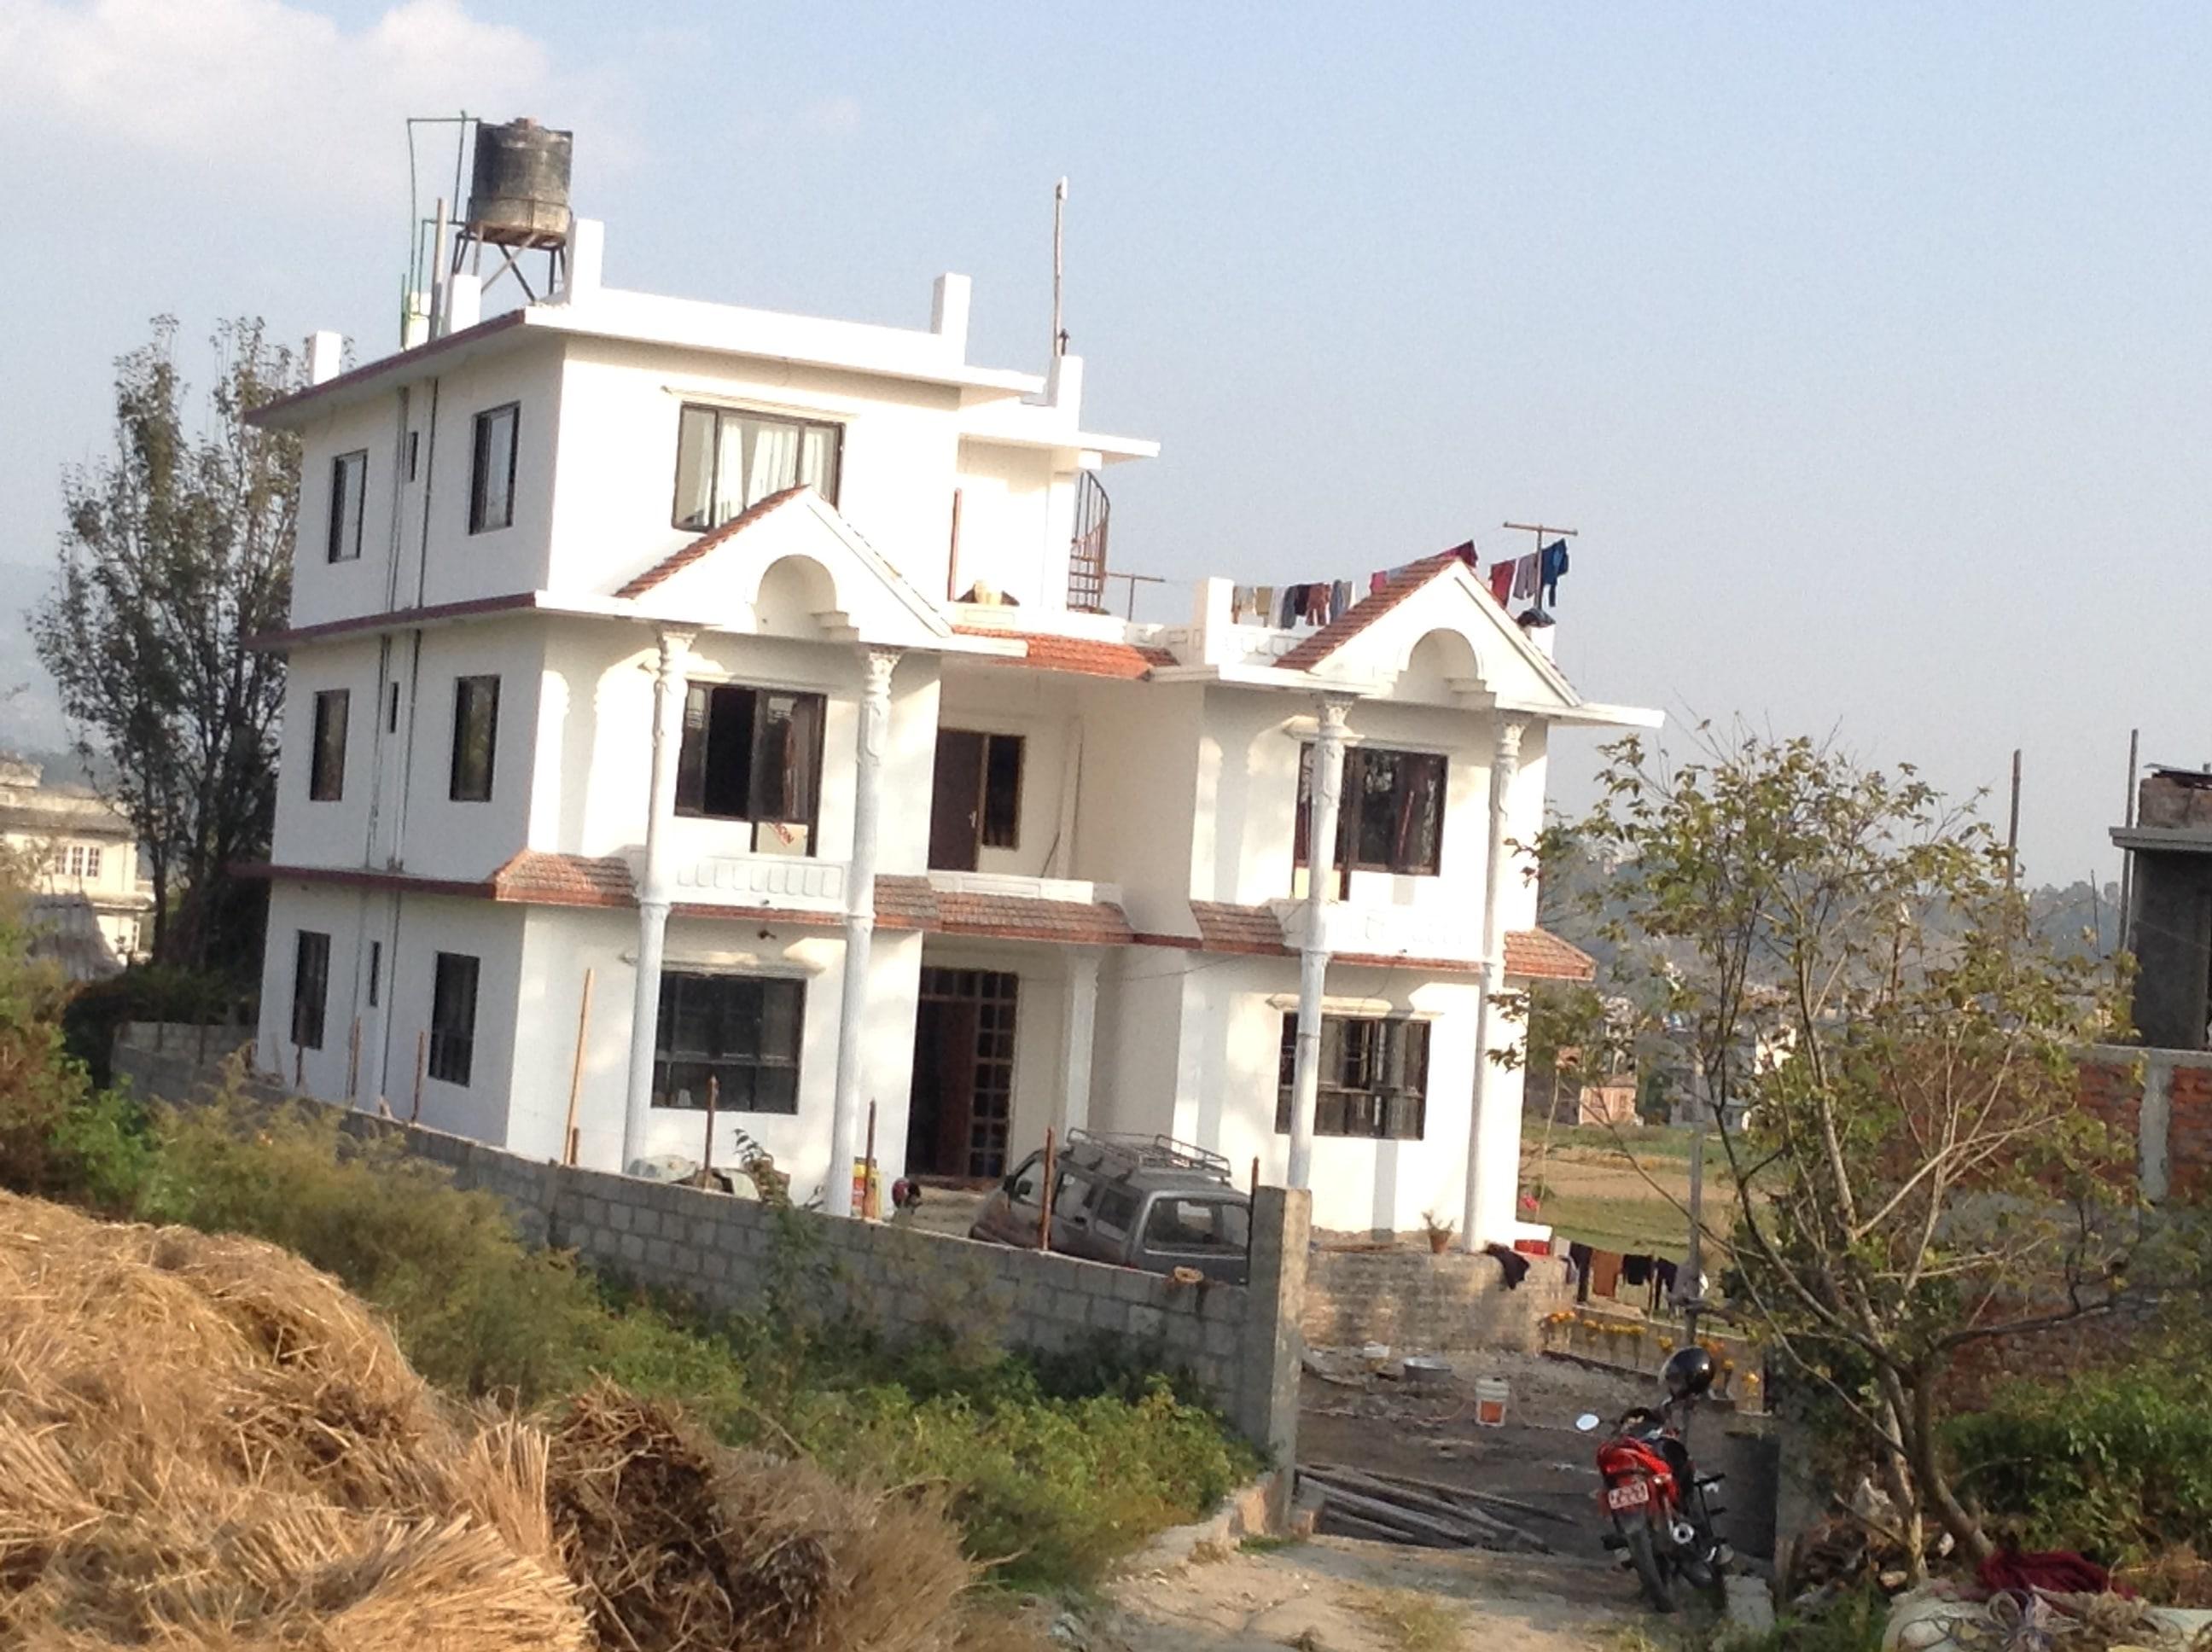 New Family House Friuli Nepal Childrens Welfare Center